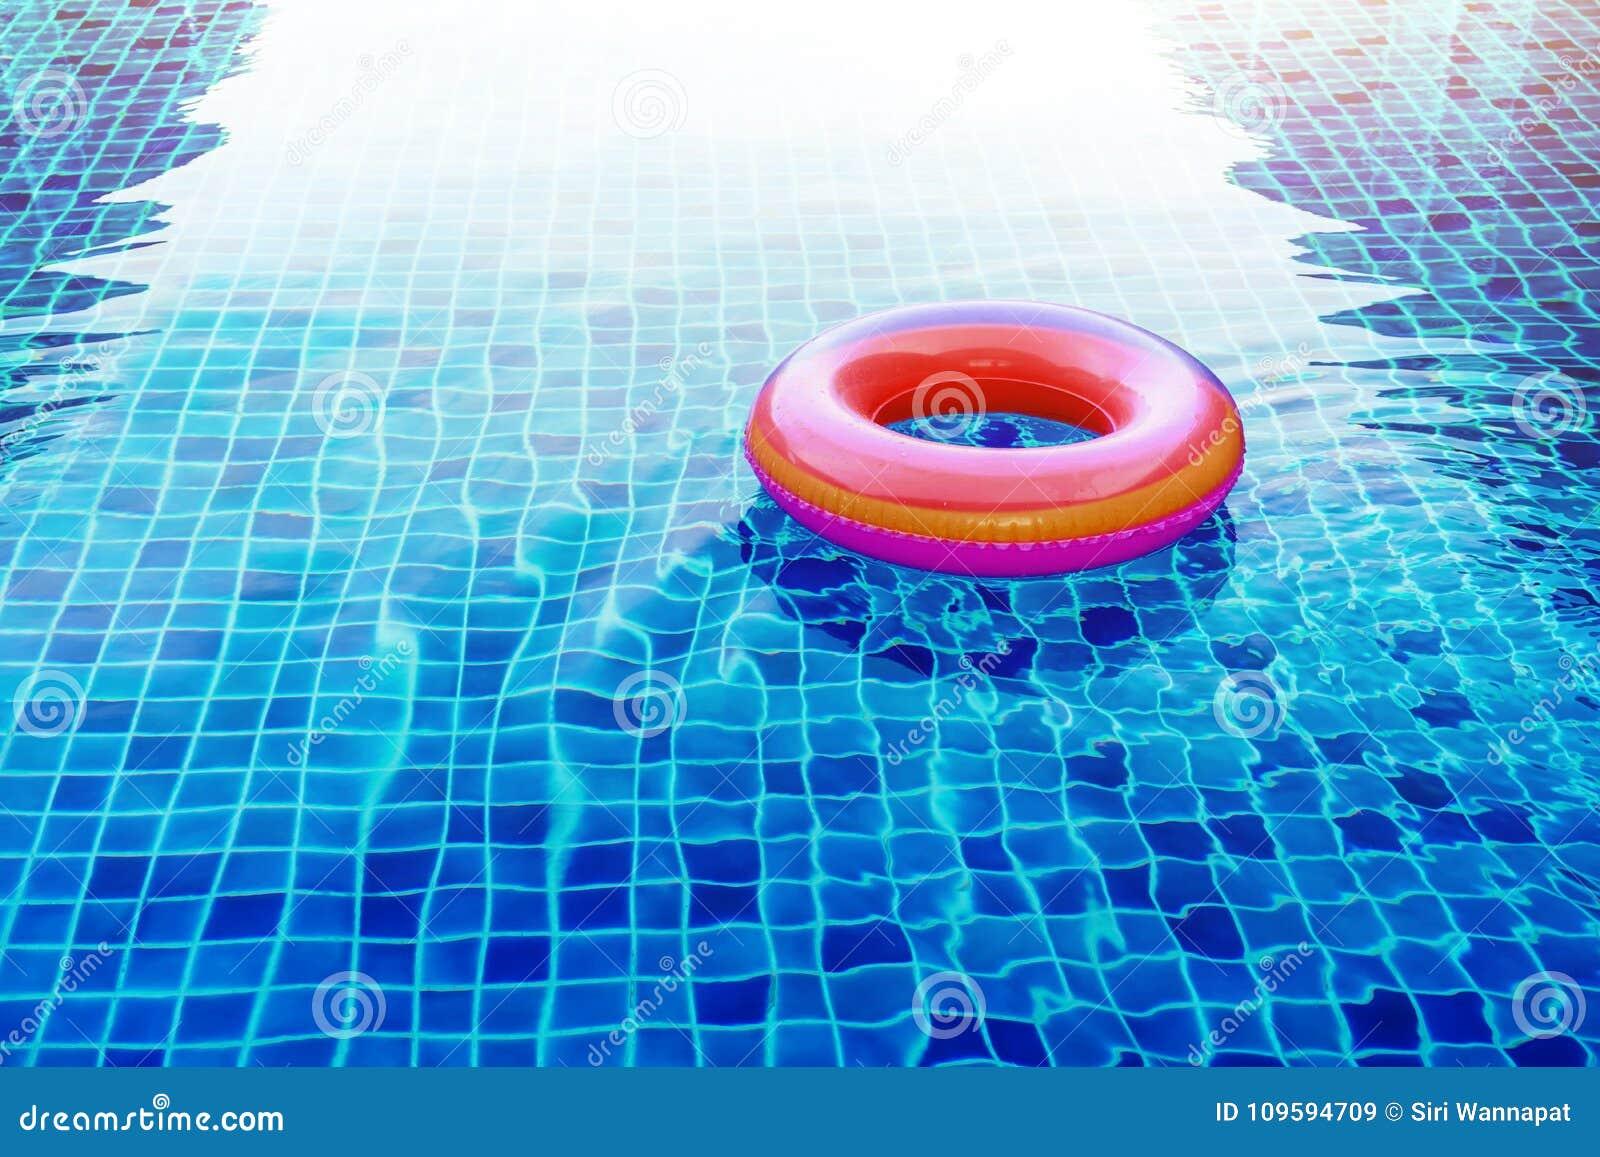 Piscina Ring Float sopra acqua blu